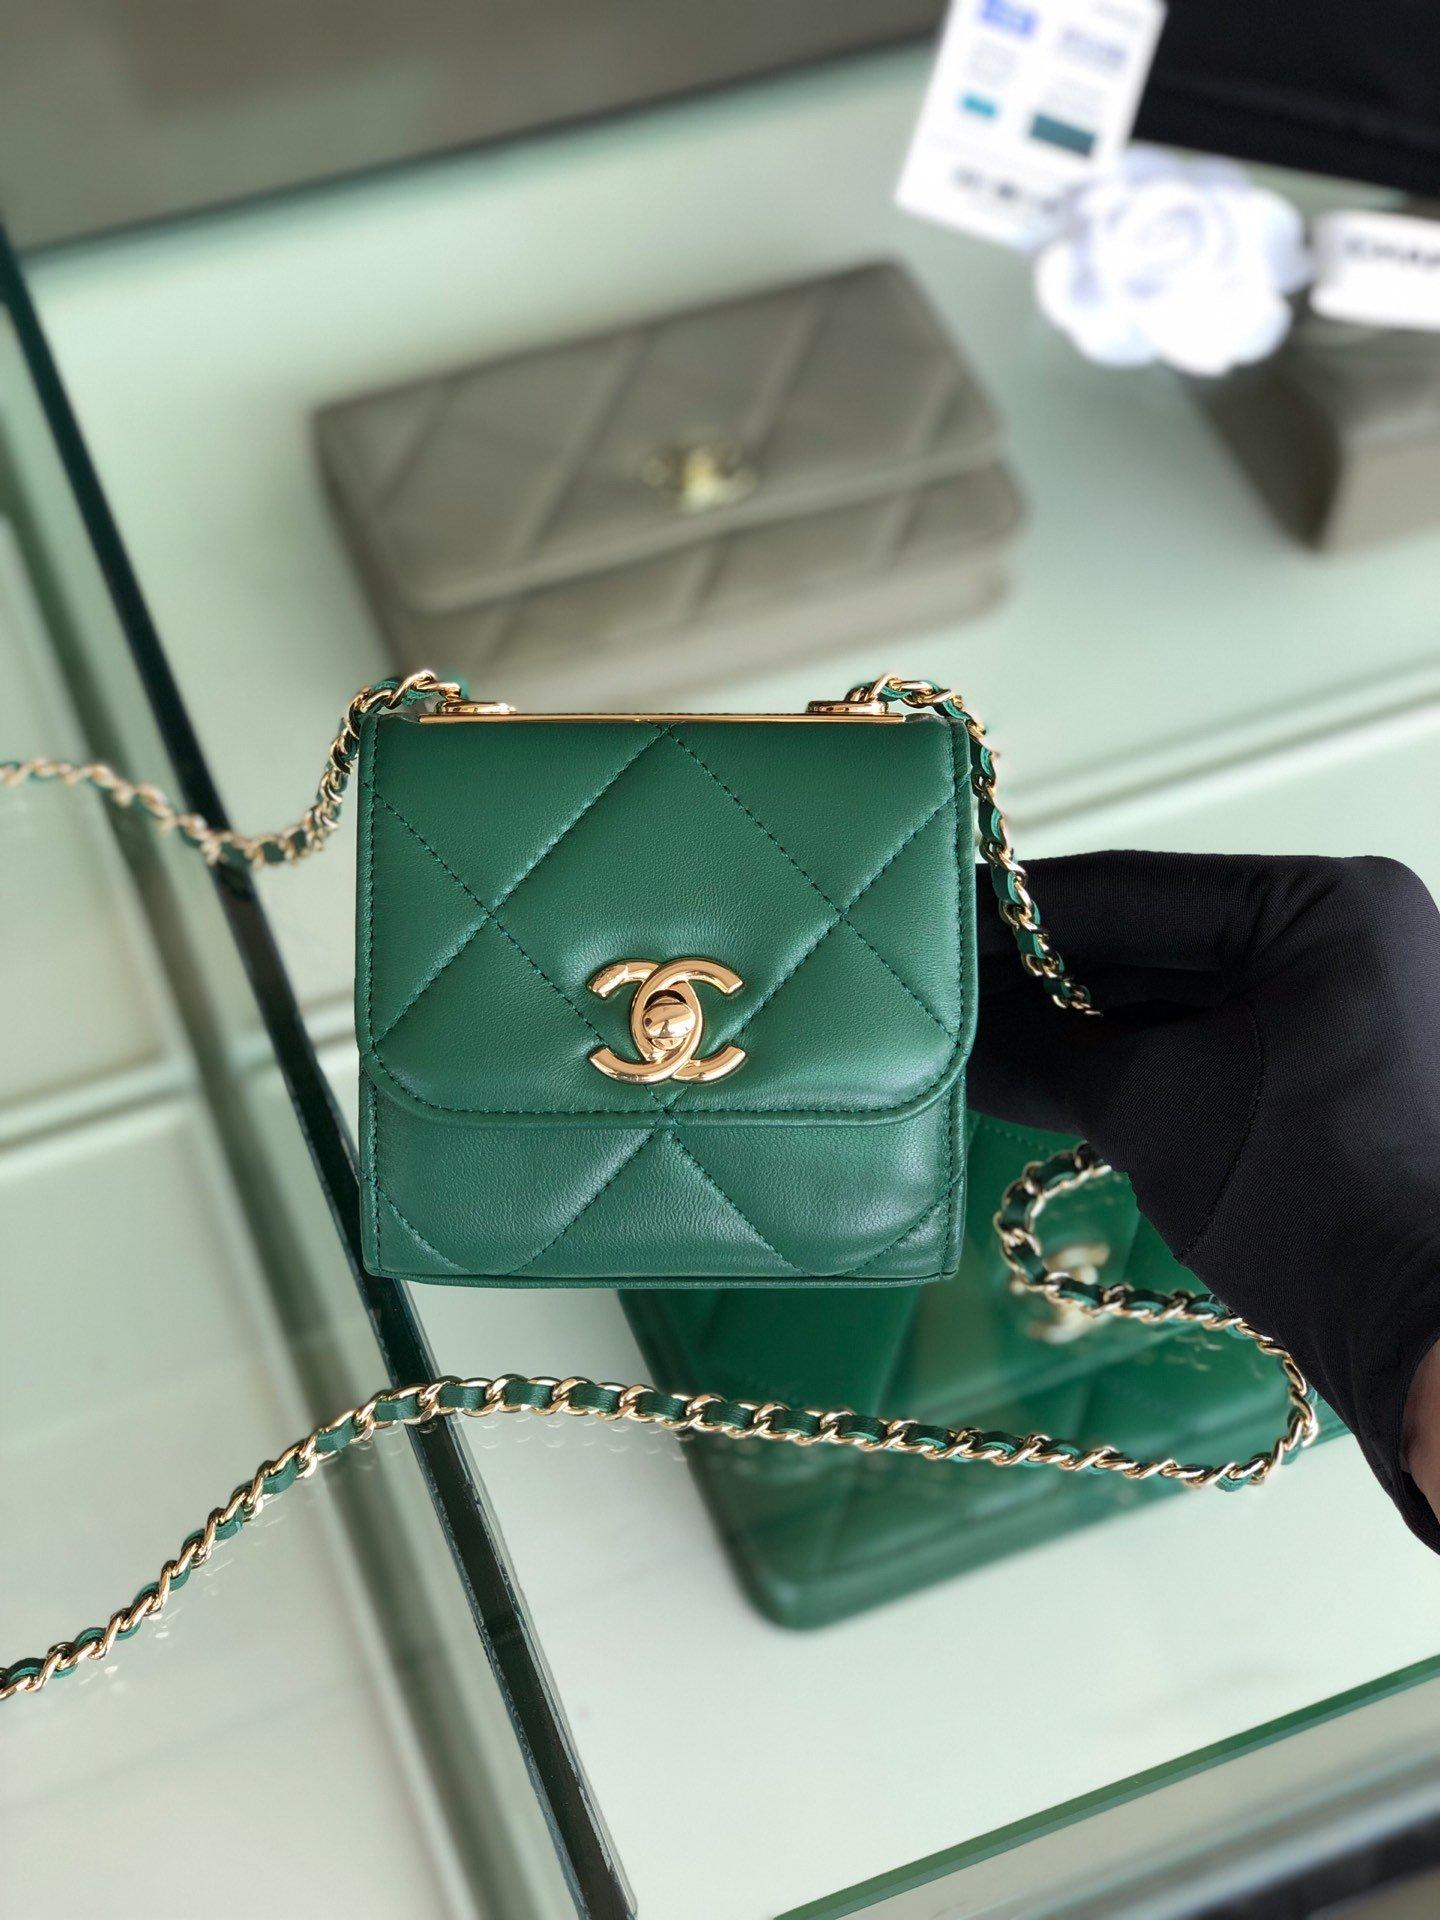 Chanel香奈儿专柜同款 大方格新款零钱包 单肩斜挎